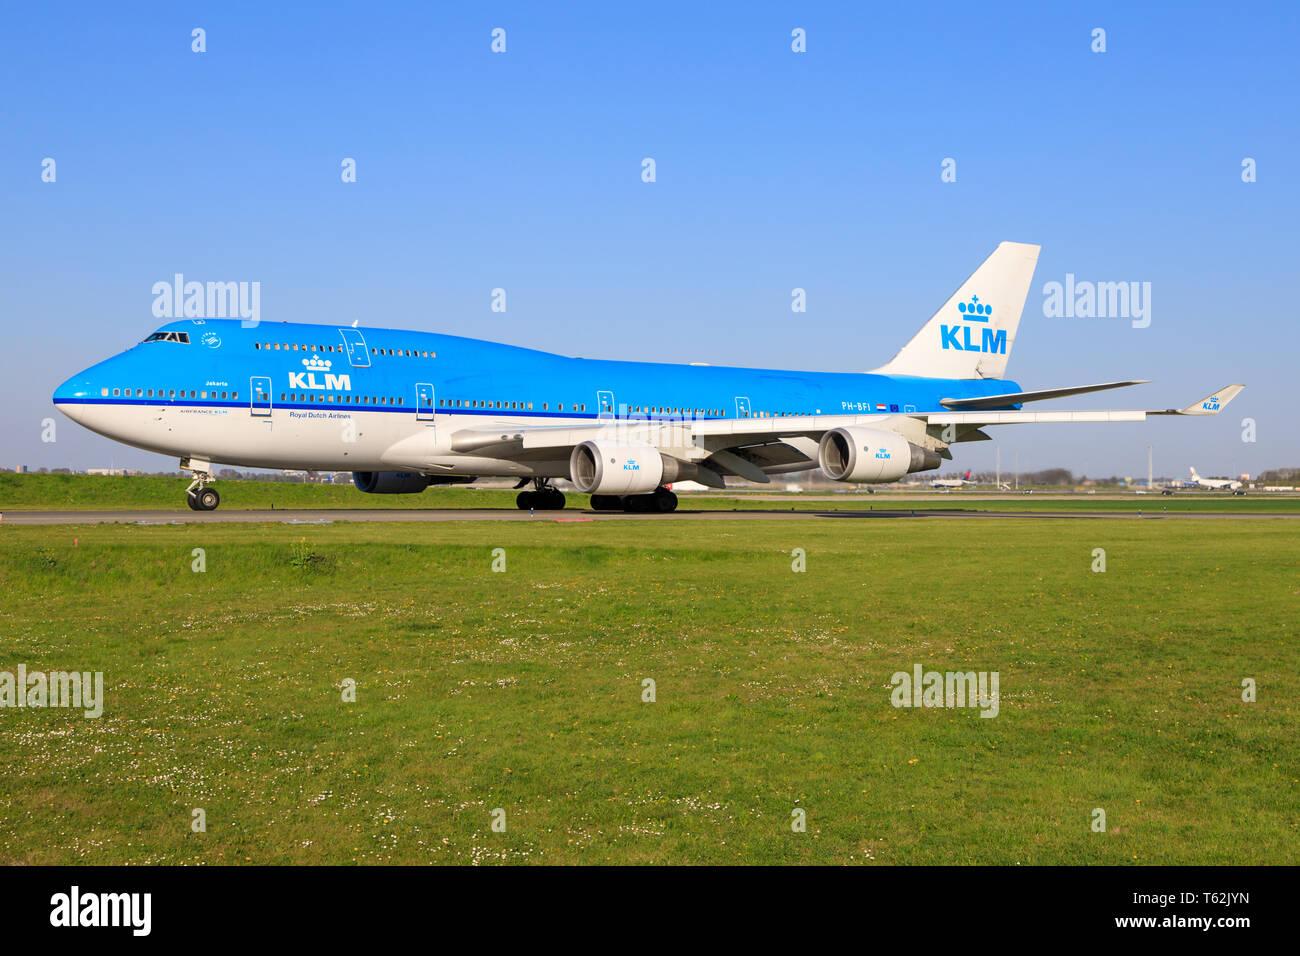 Amsterdam/Netherland Mai 26, 2019: KLM Boeing 747 last flight at Amsterdam Airport. - Stock Image